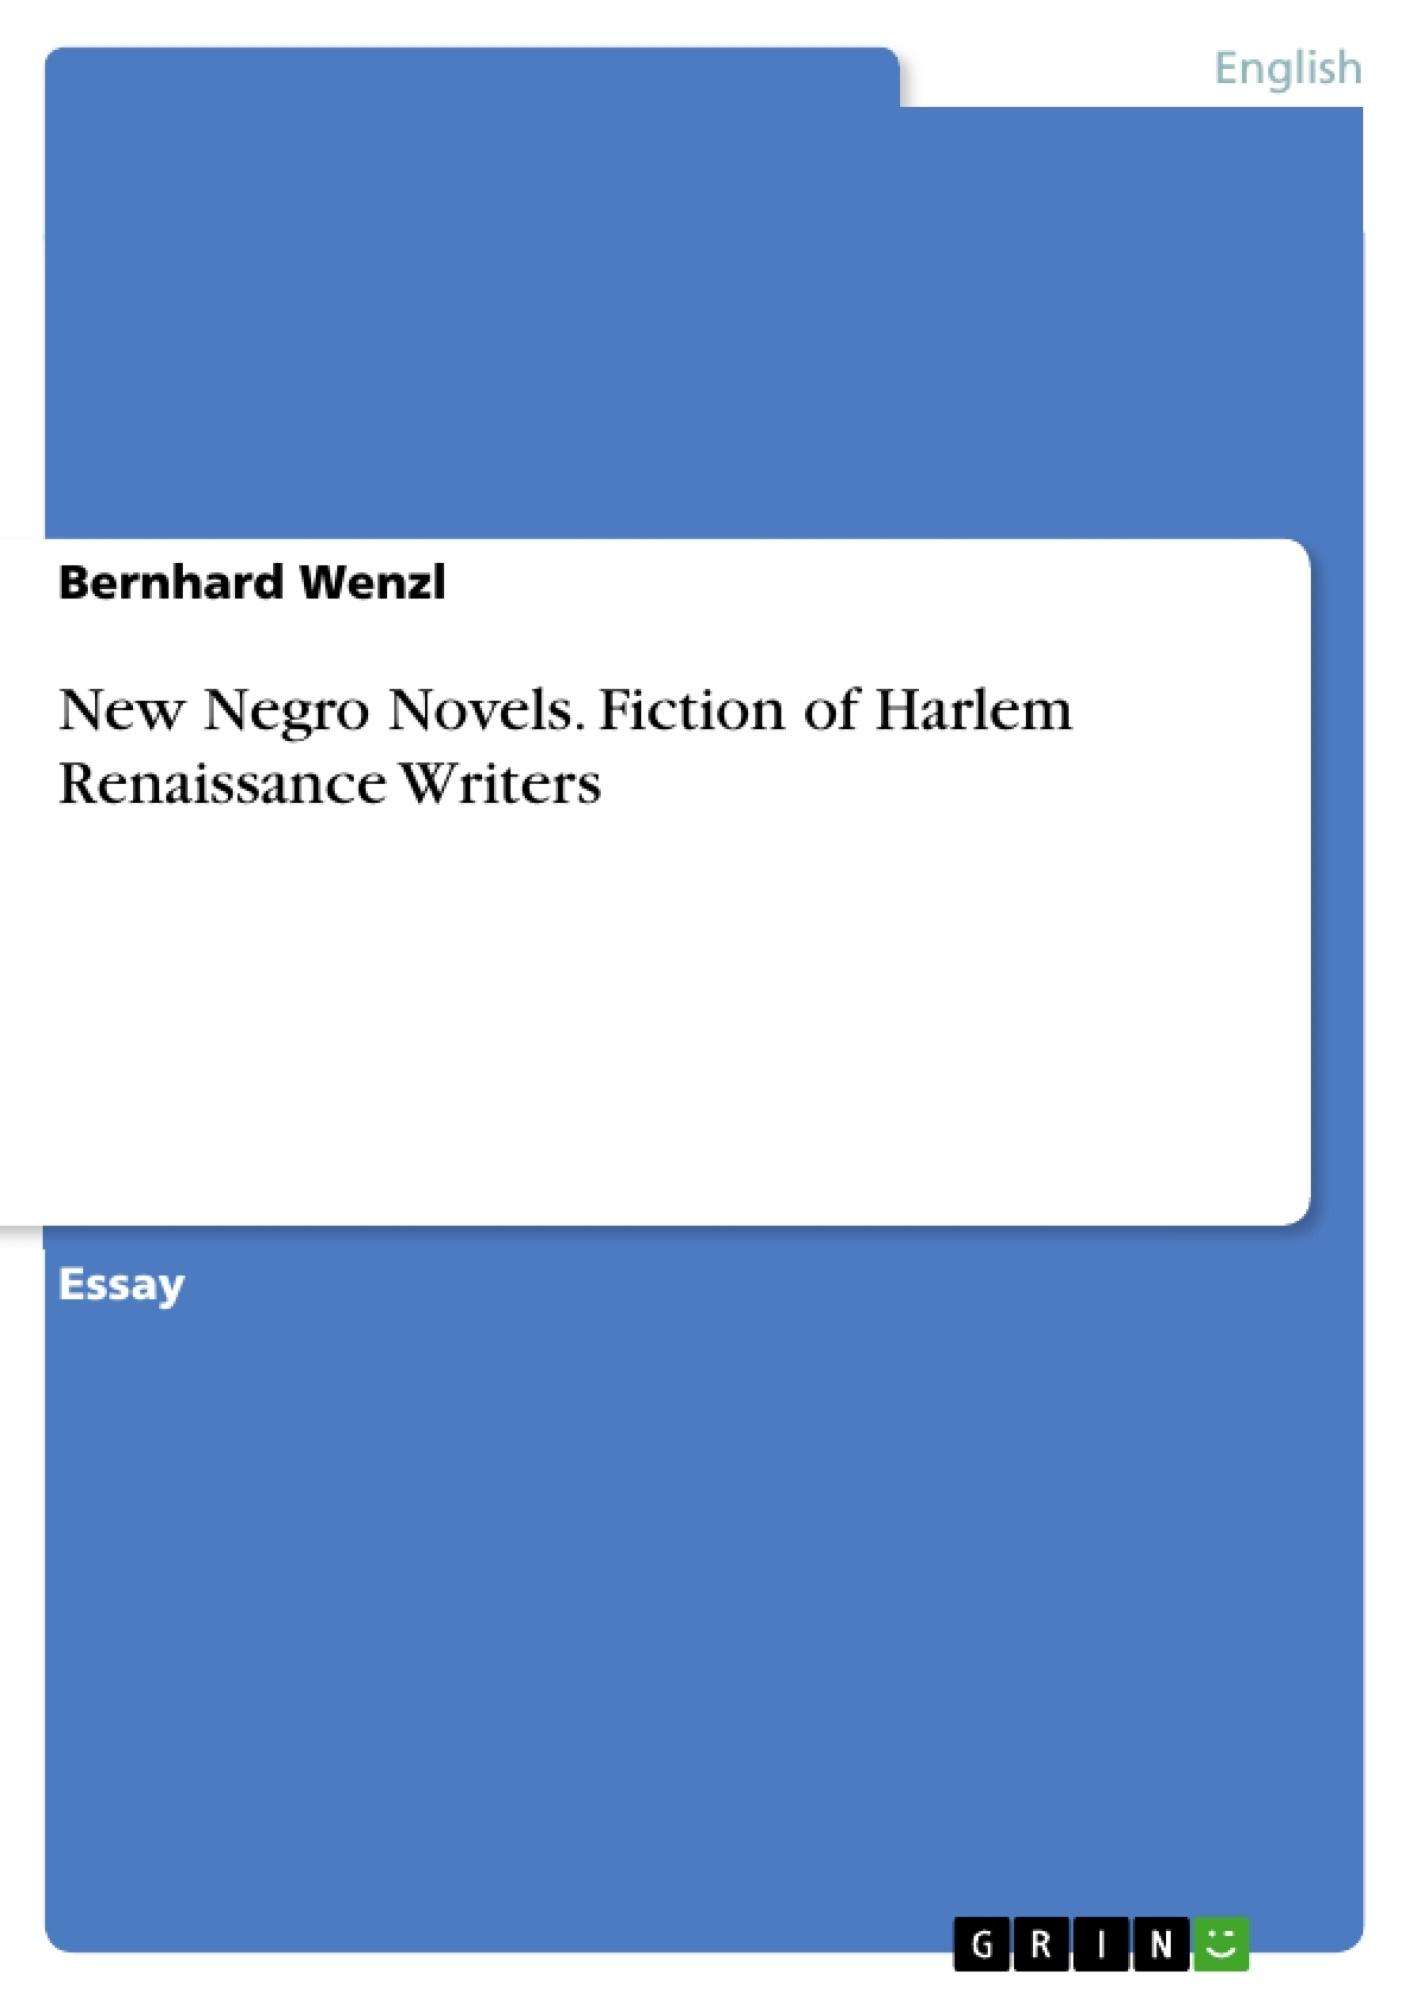 Title: New Negro Novels. Fiction of Harlem Renaissance Writers